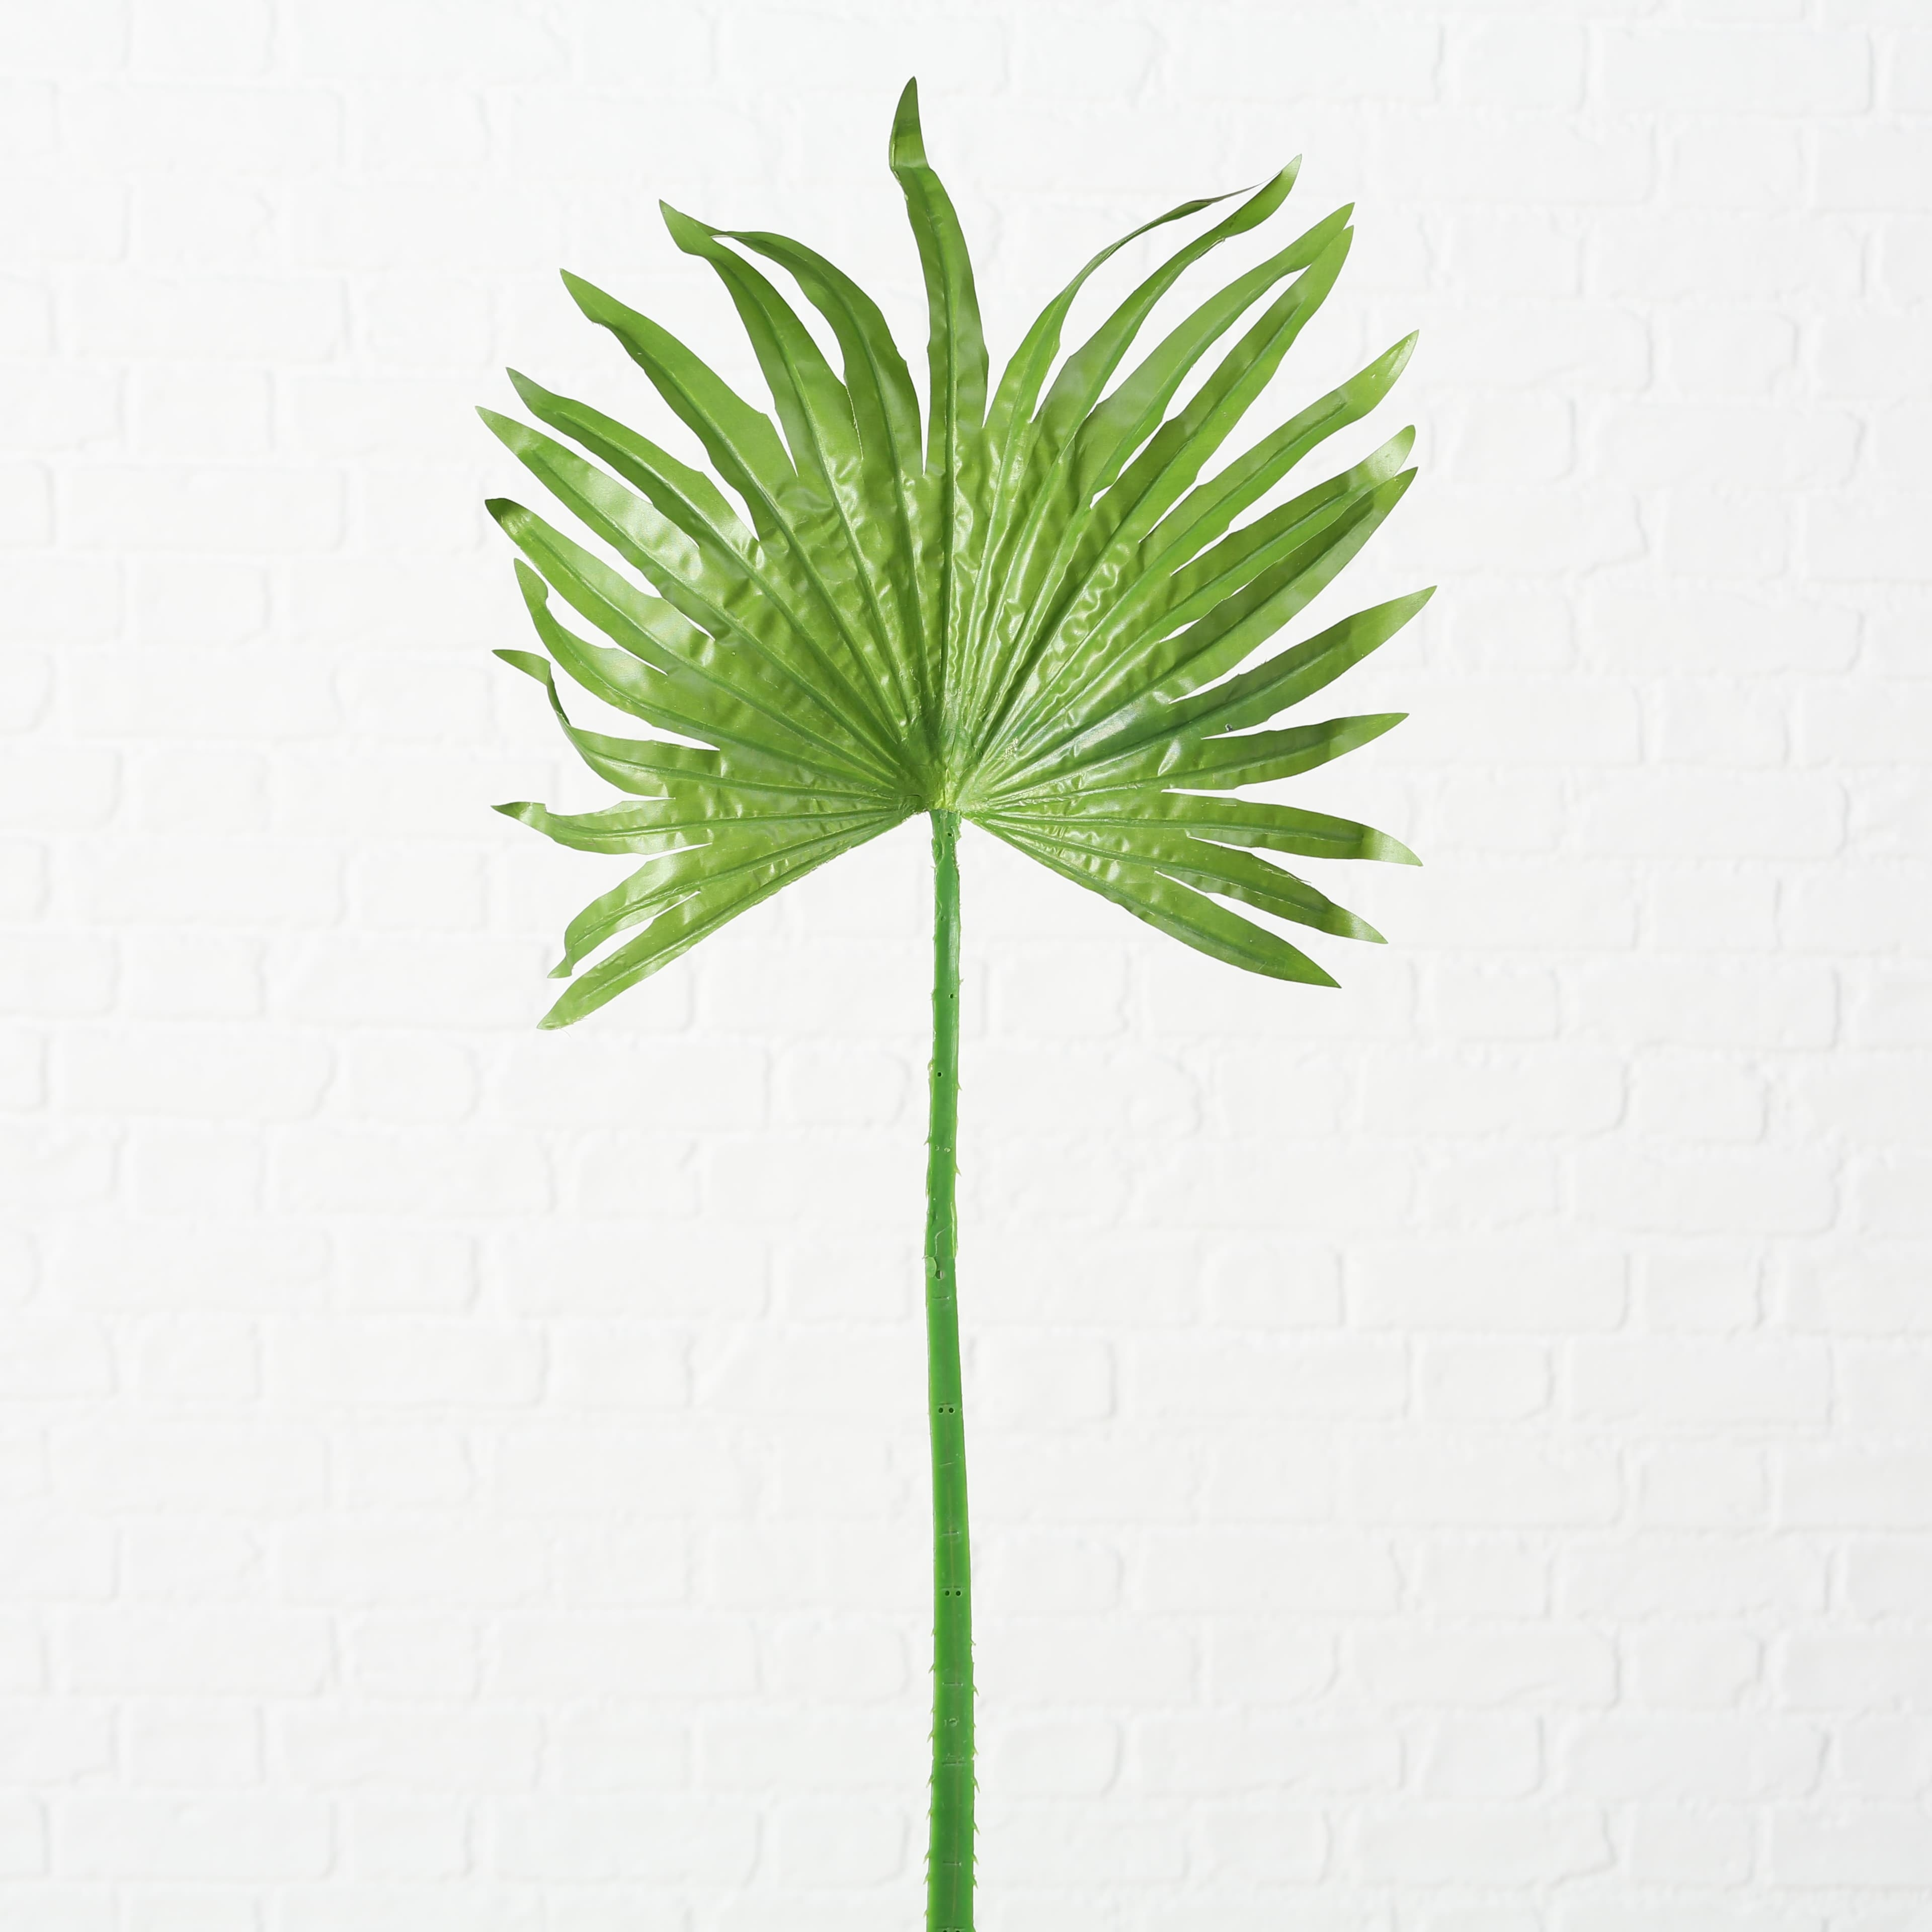 Frunza decorativa artificiala Blatt Palm Verde, H97 cm imagine